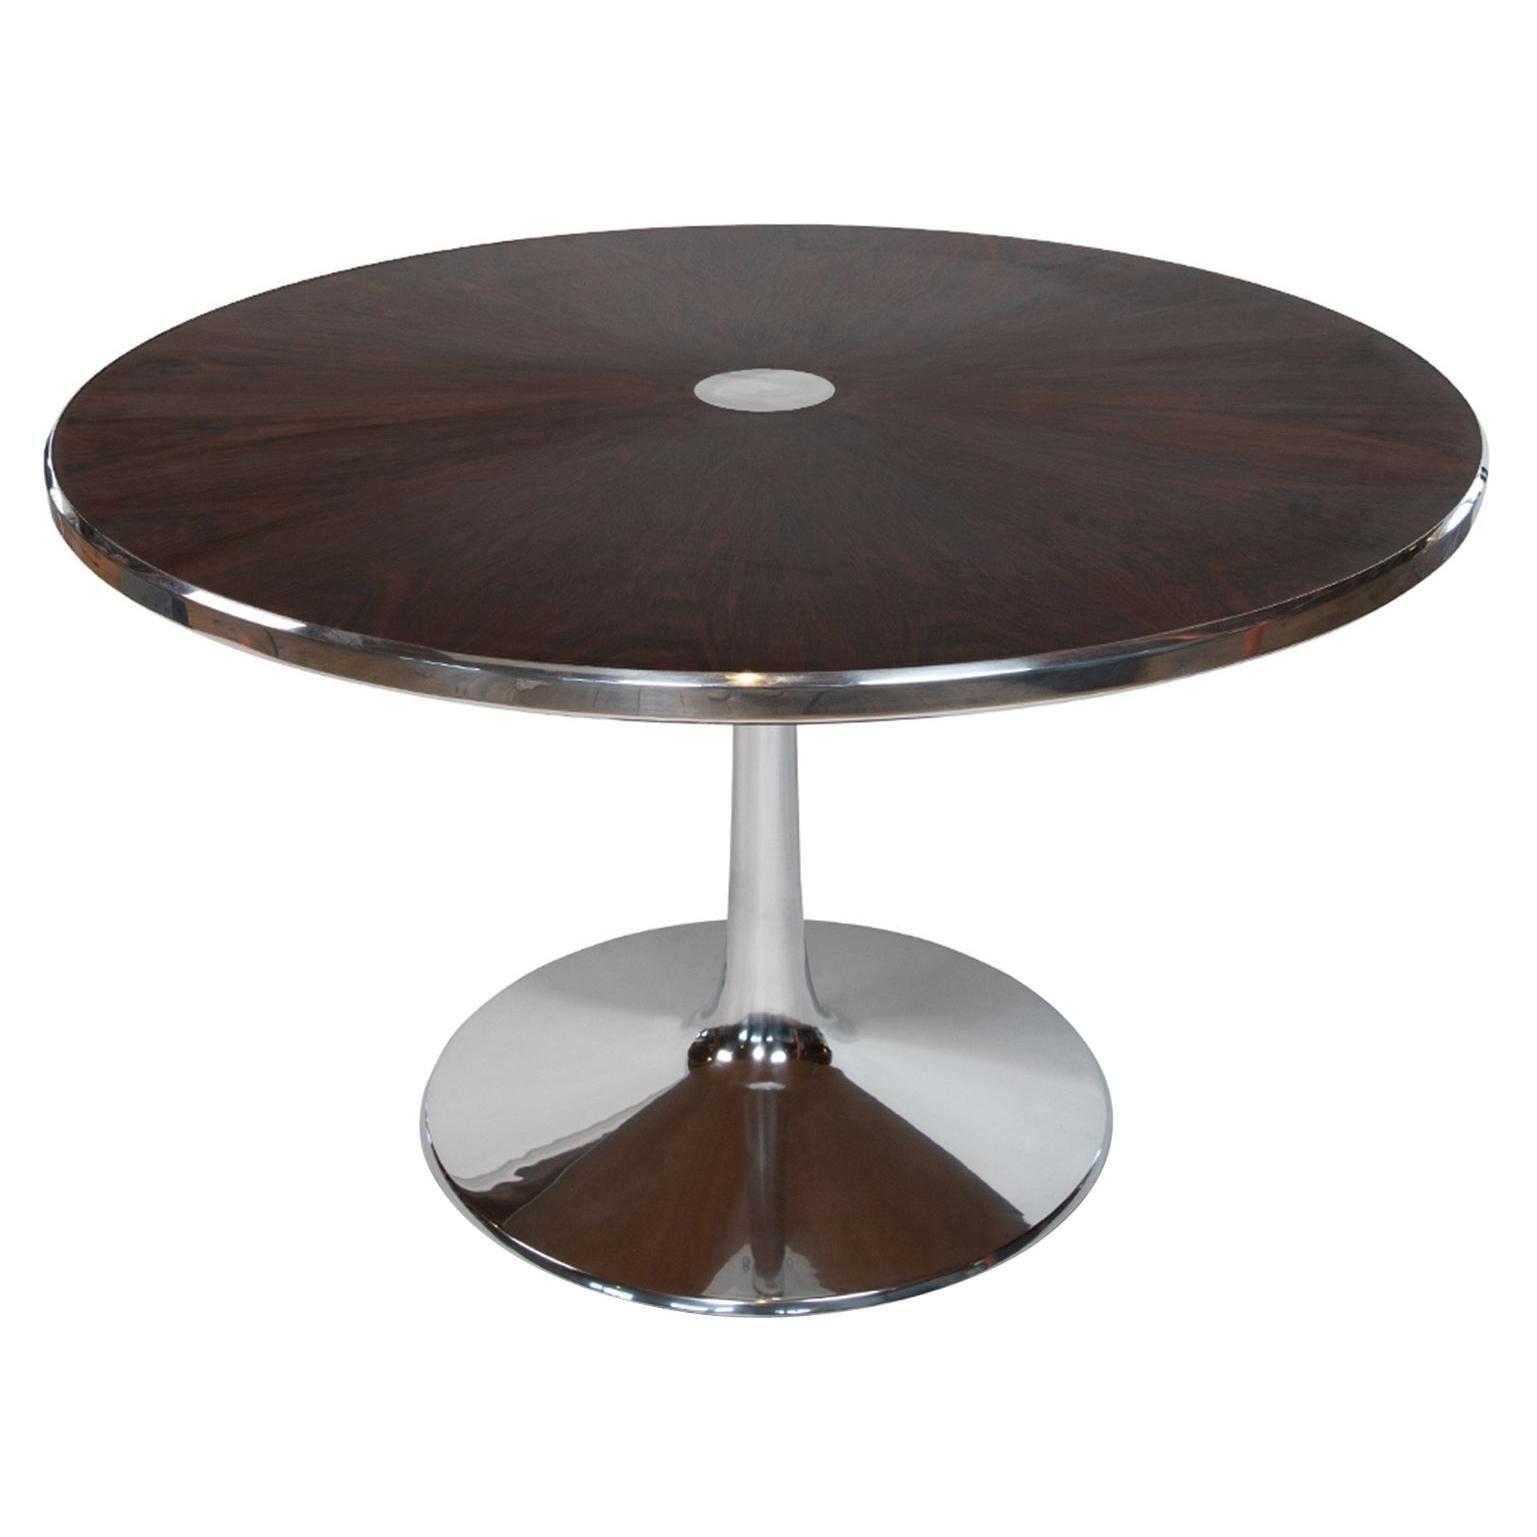 Cado Rosewood & Aluminum Dining Table